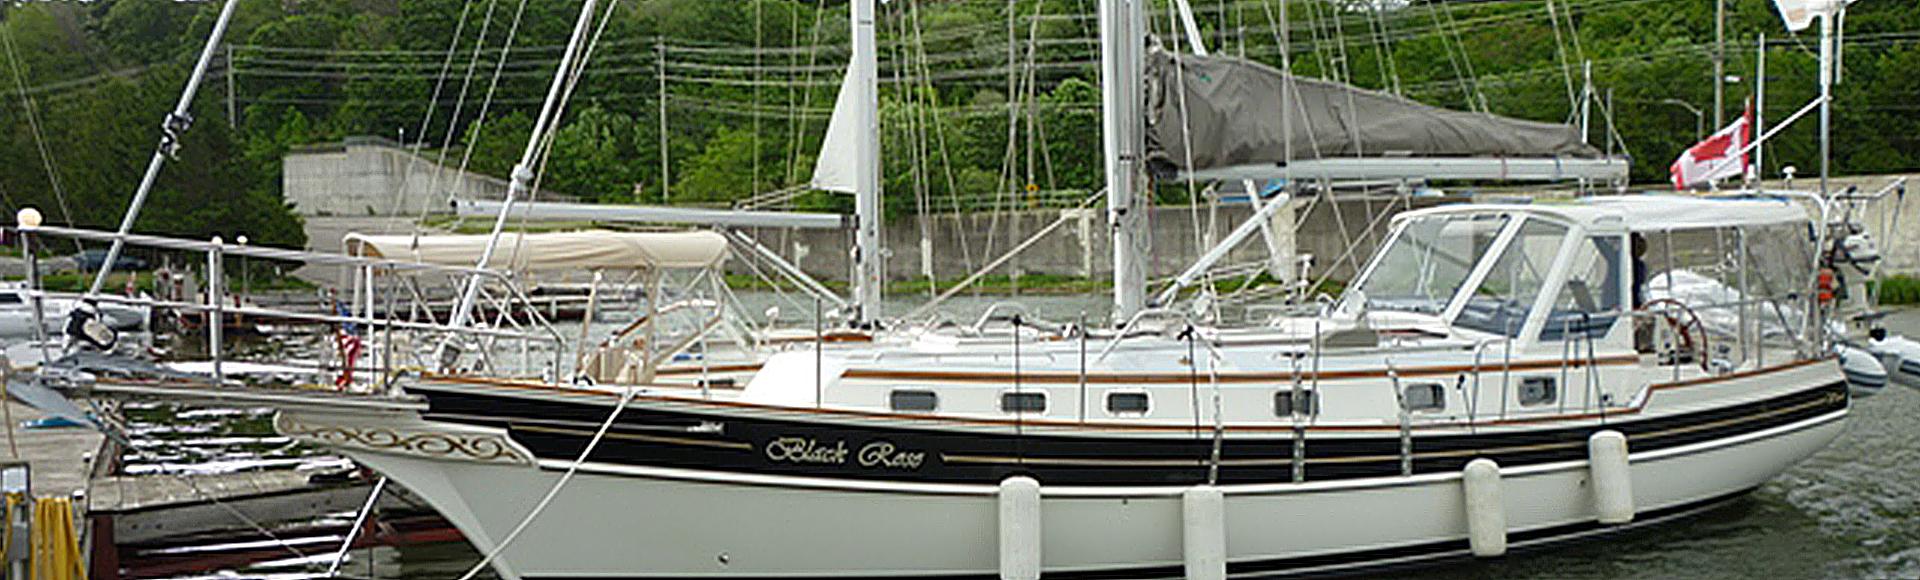 "SOLD Spring 2021 – 2002 Gozzard 41A Hull #3 ""Black Rose"""